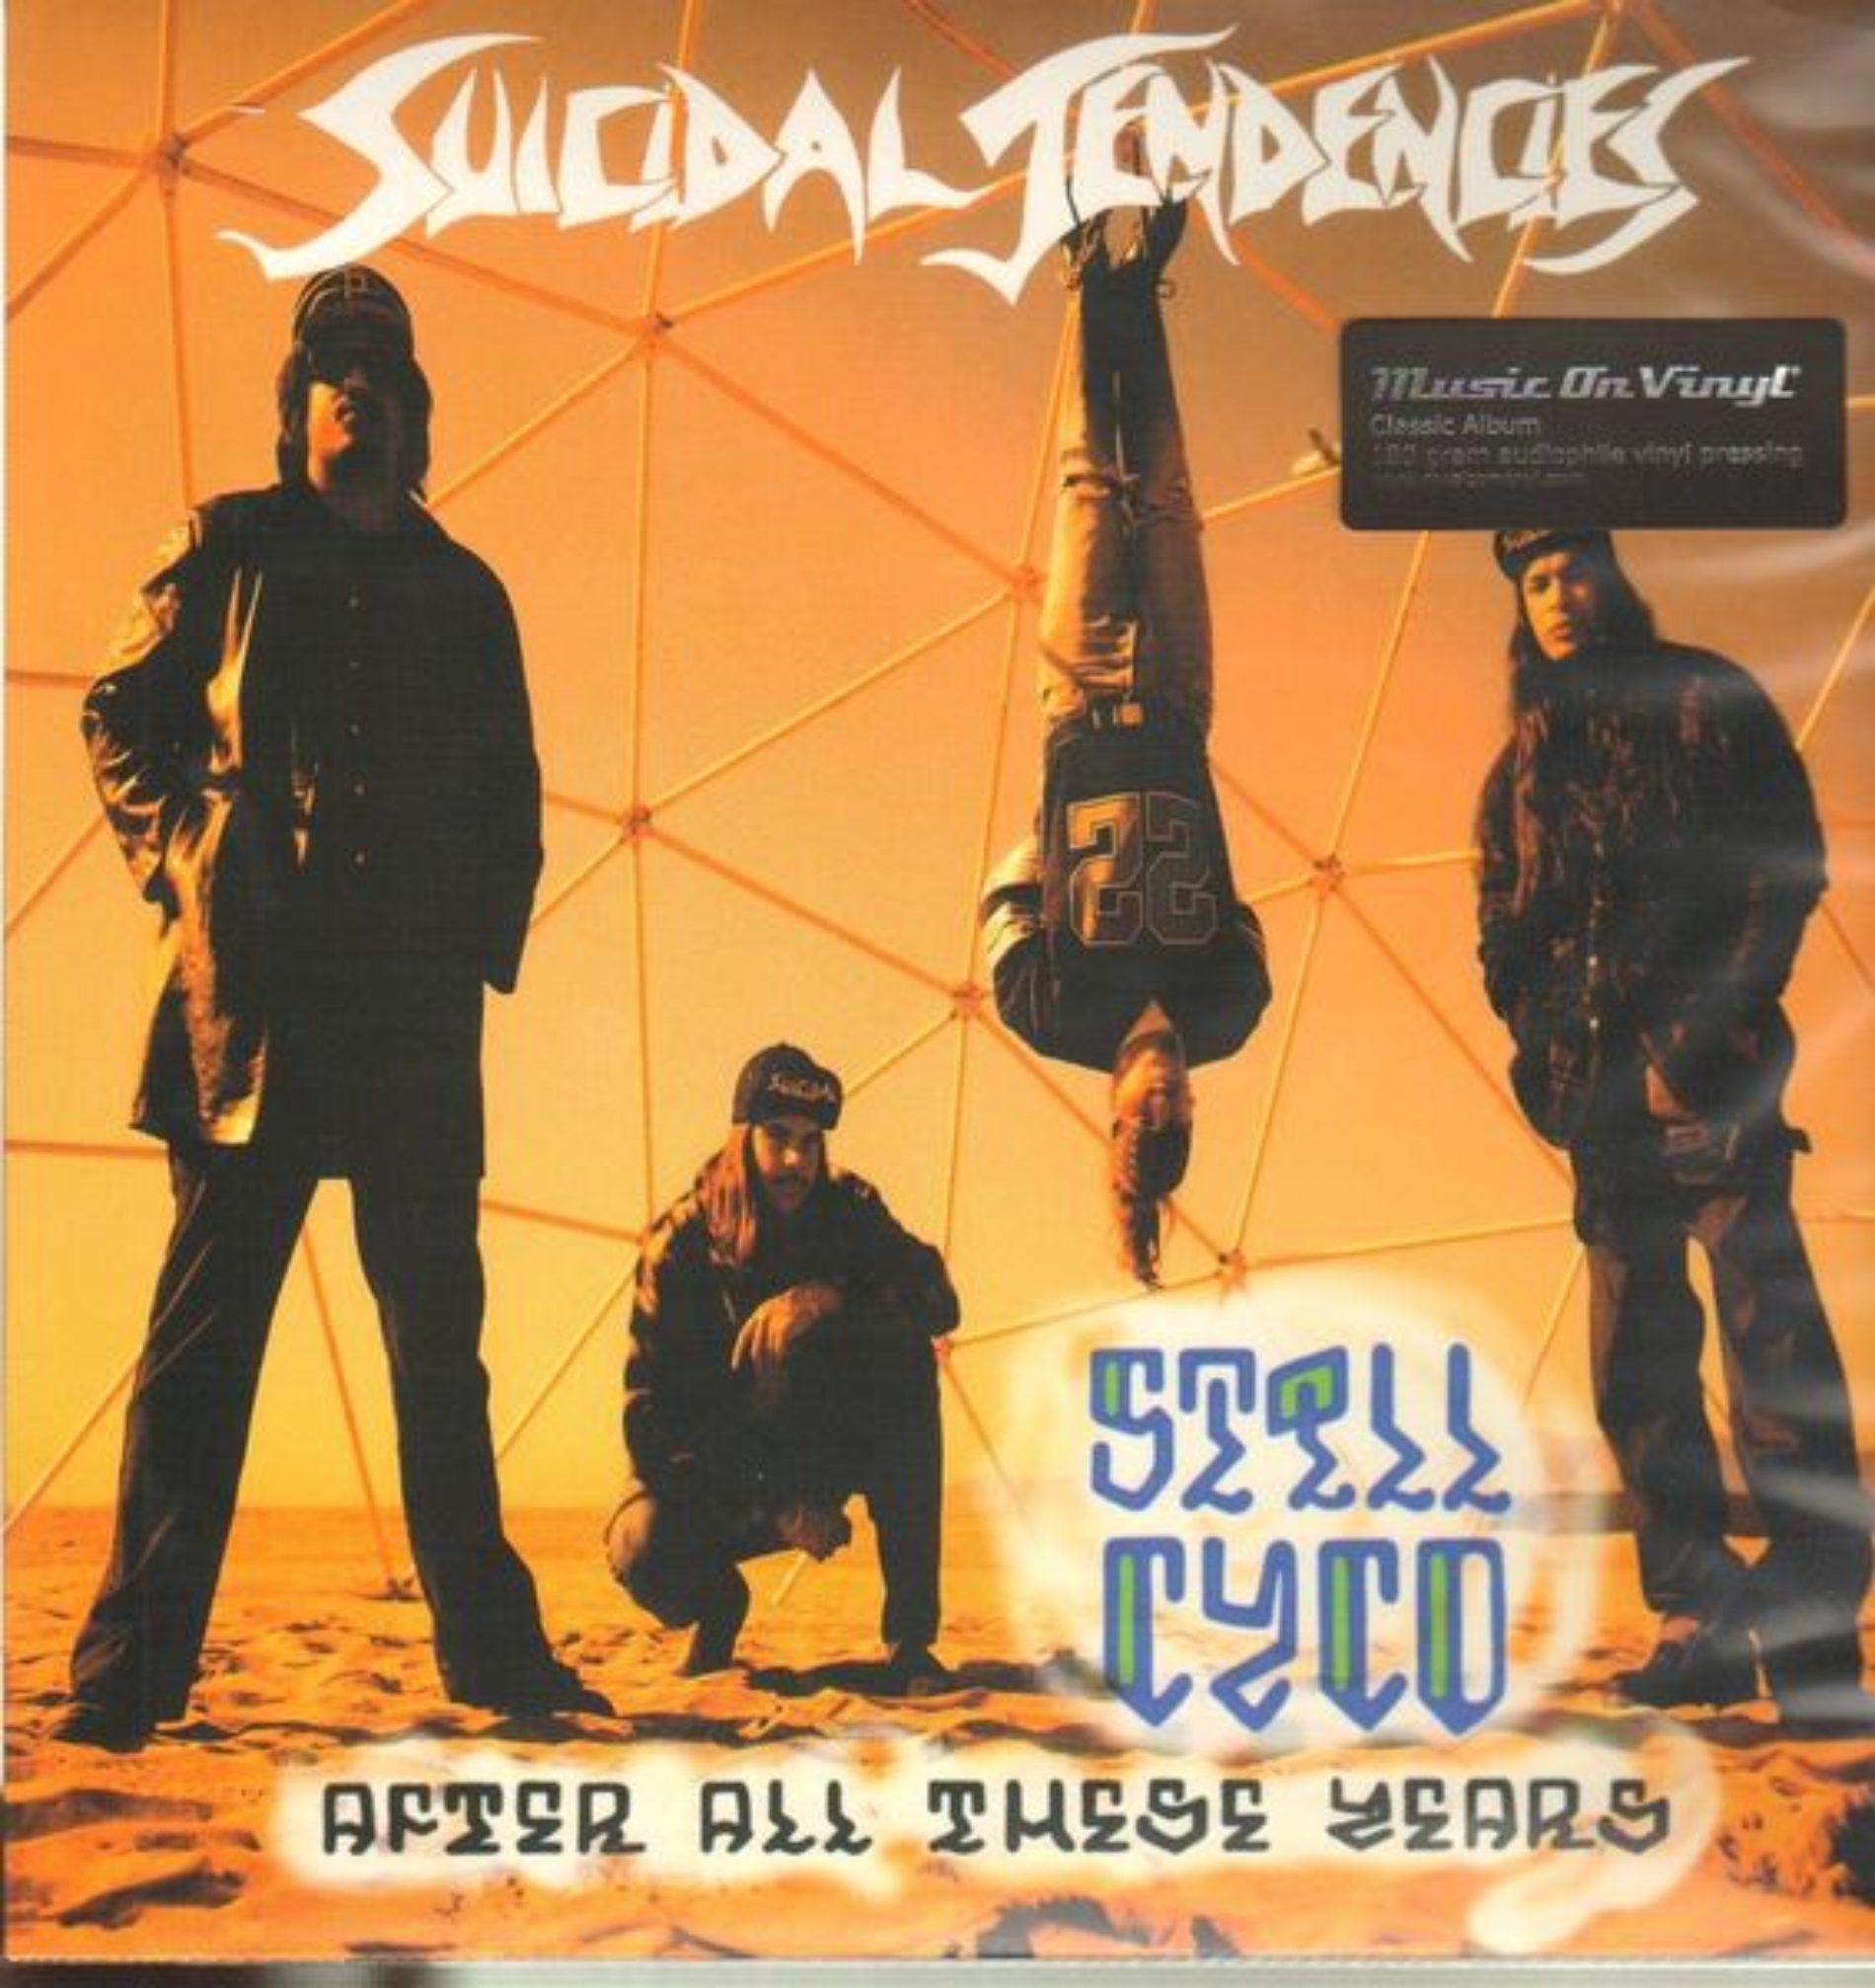 Suicidal Tendencies – Still Cyco Punk World Wide Tour 2018